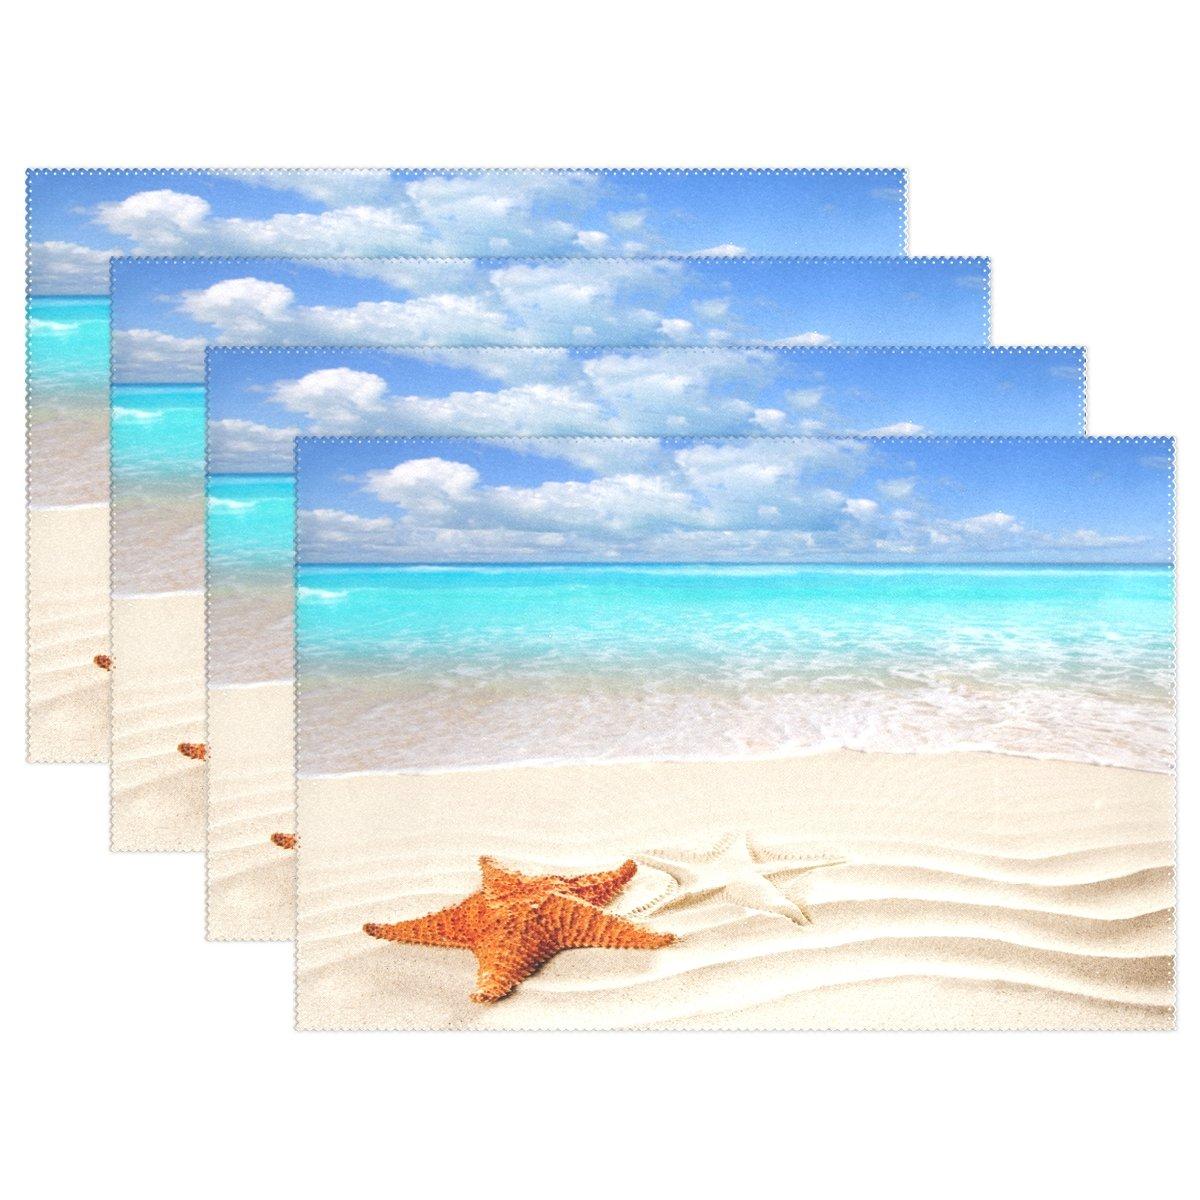 Summer Vacation Caribbeanヒトデover wavy white sand beach耐熱表プレースマットStain Resistantのテーブルマット洗濯可能食べマットホームキッチン 1 マルチ1 B076KBSSRS